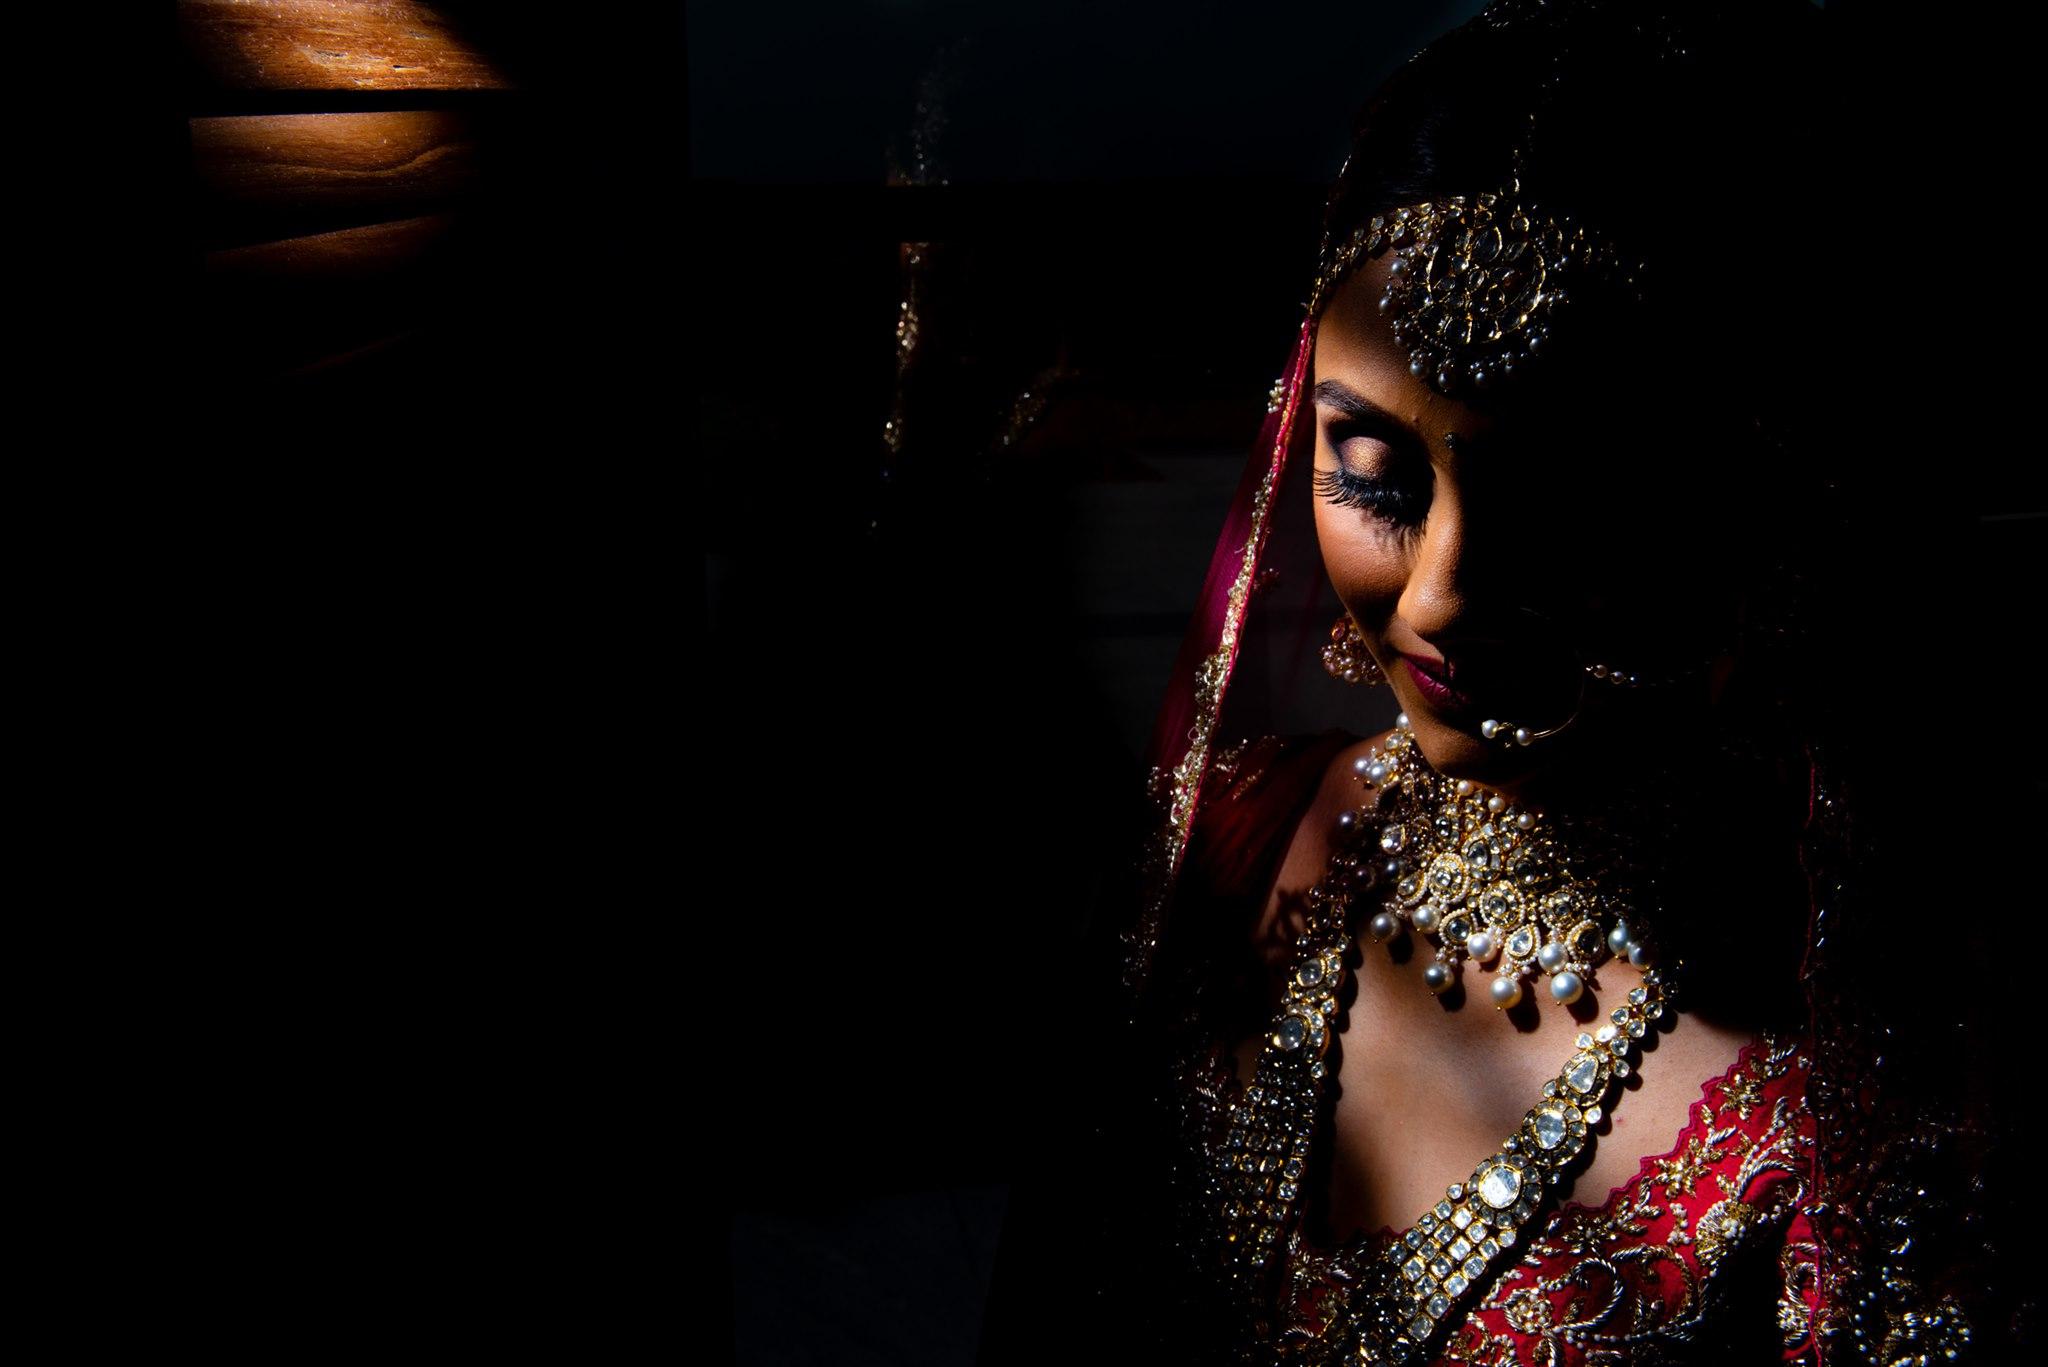 narracia-wygledacz-photographe-mariage-portfolio-05.jpg